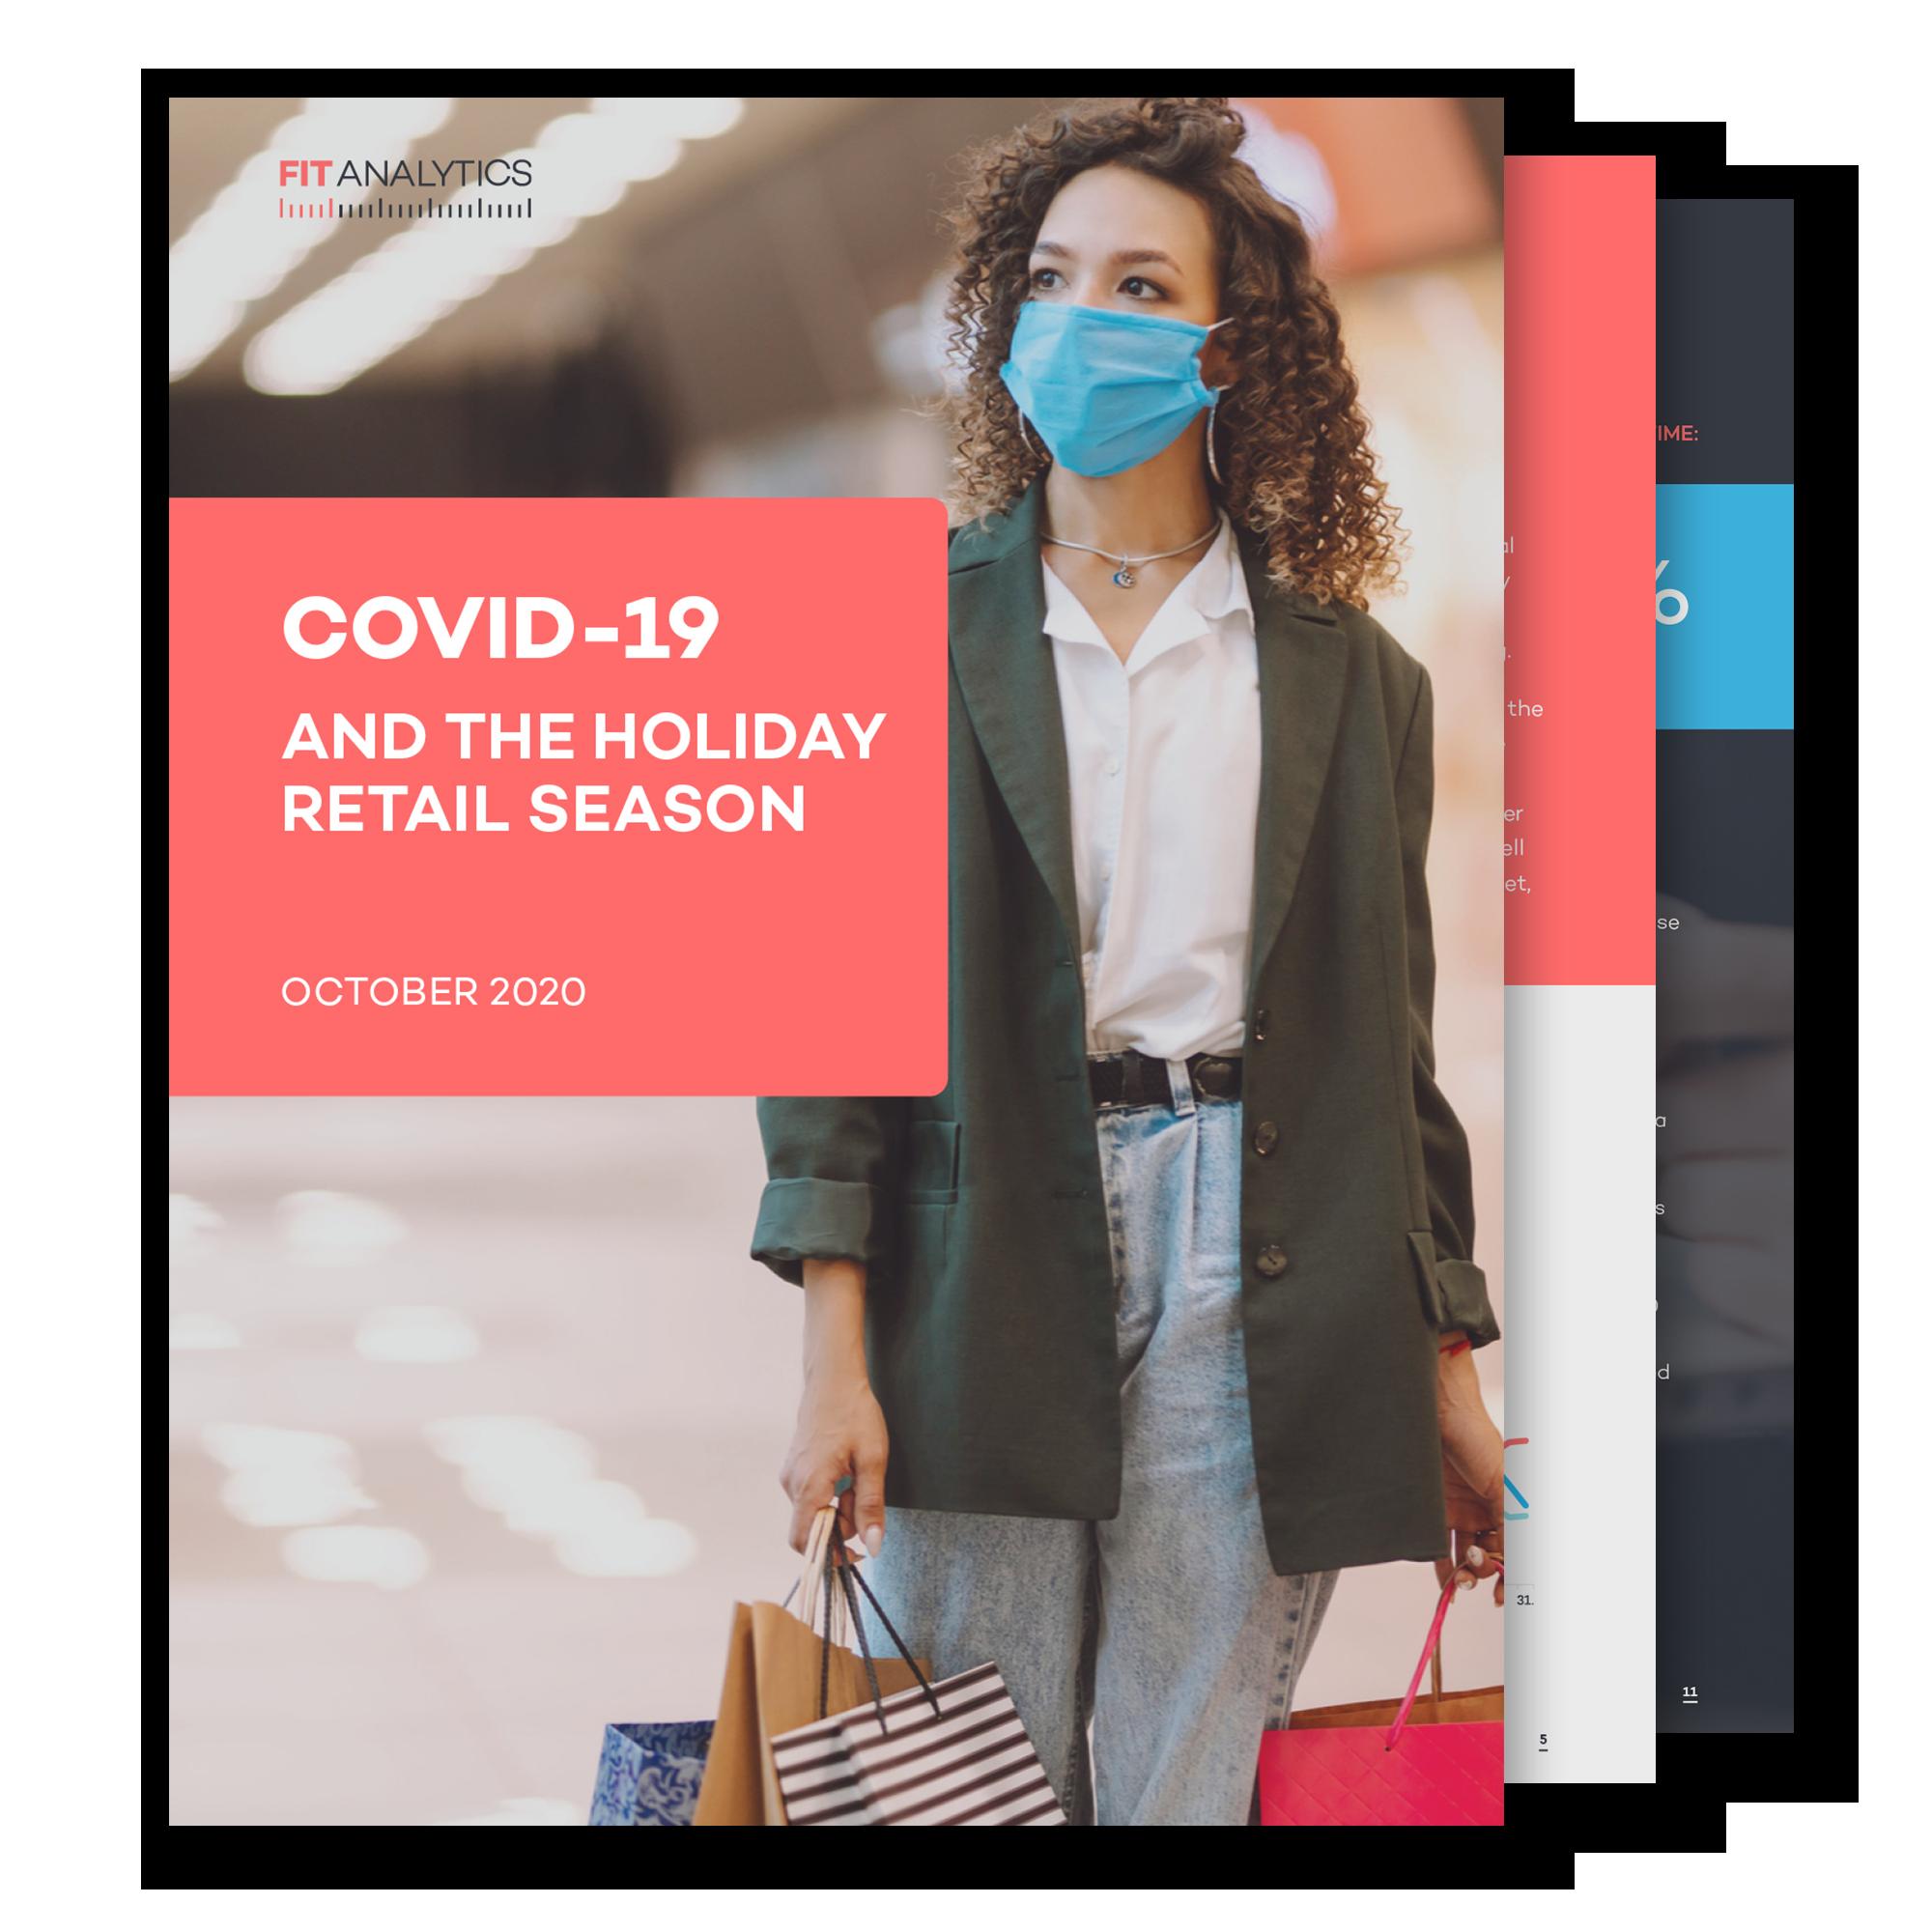 COVID19-and-the-holiday-retail-season